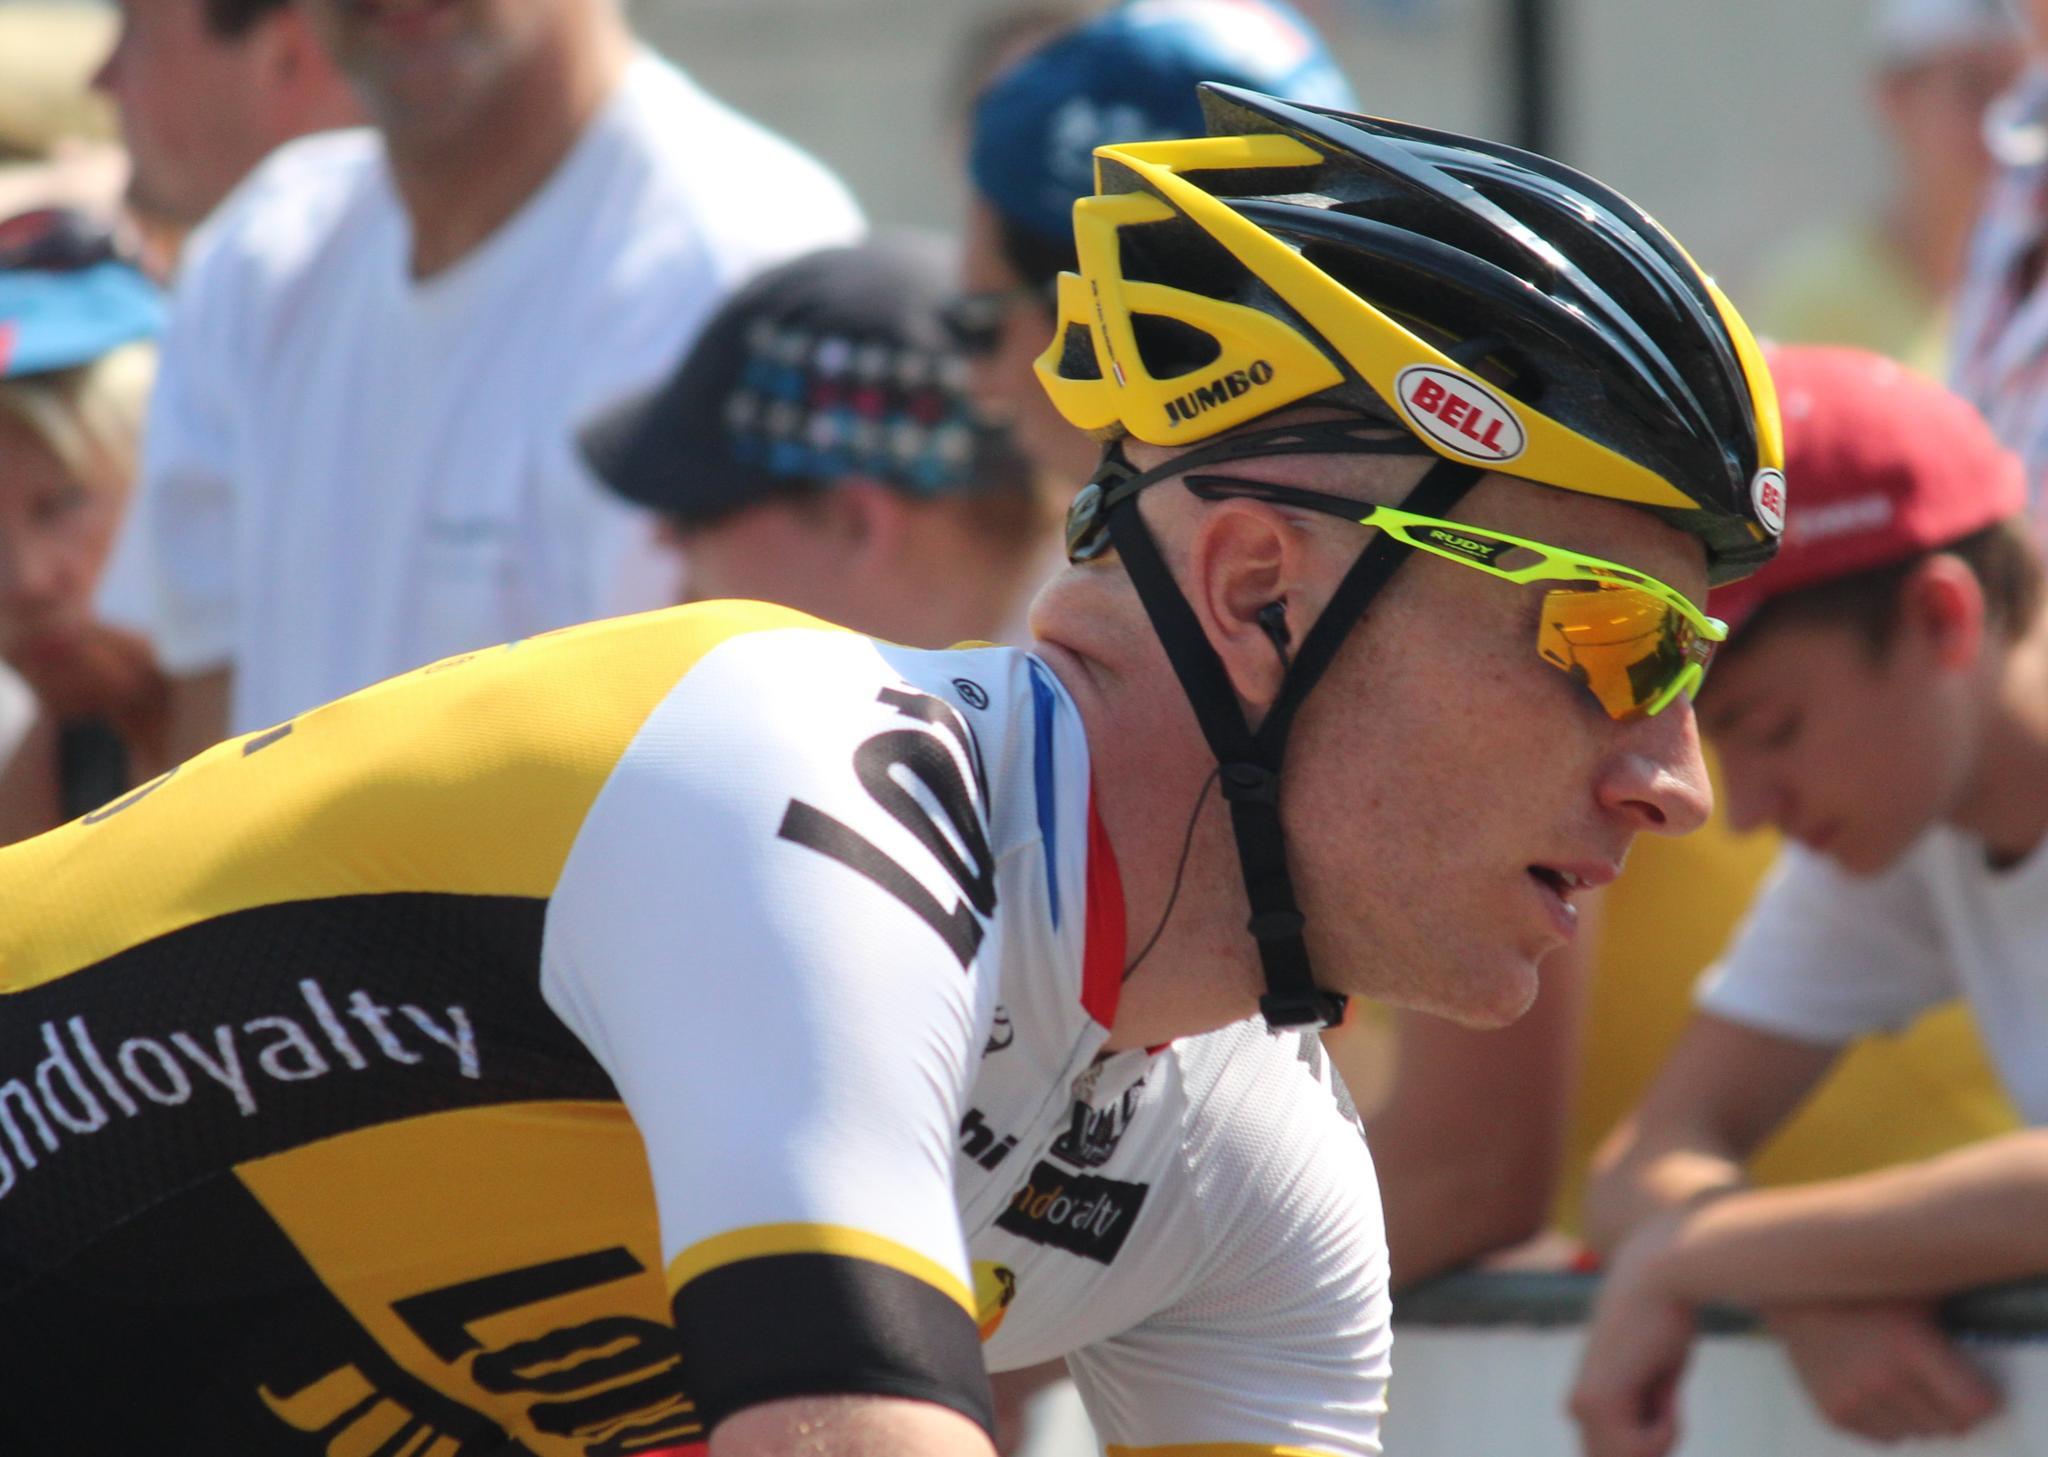 Start Tour de France in Utrecht 33 by H.Boorsma